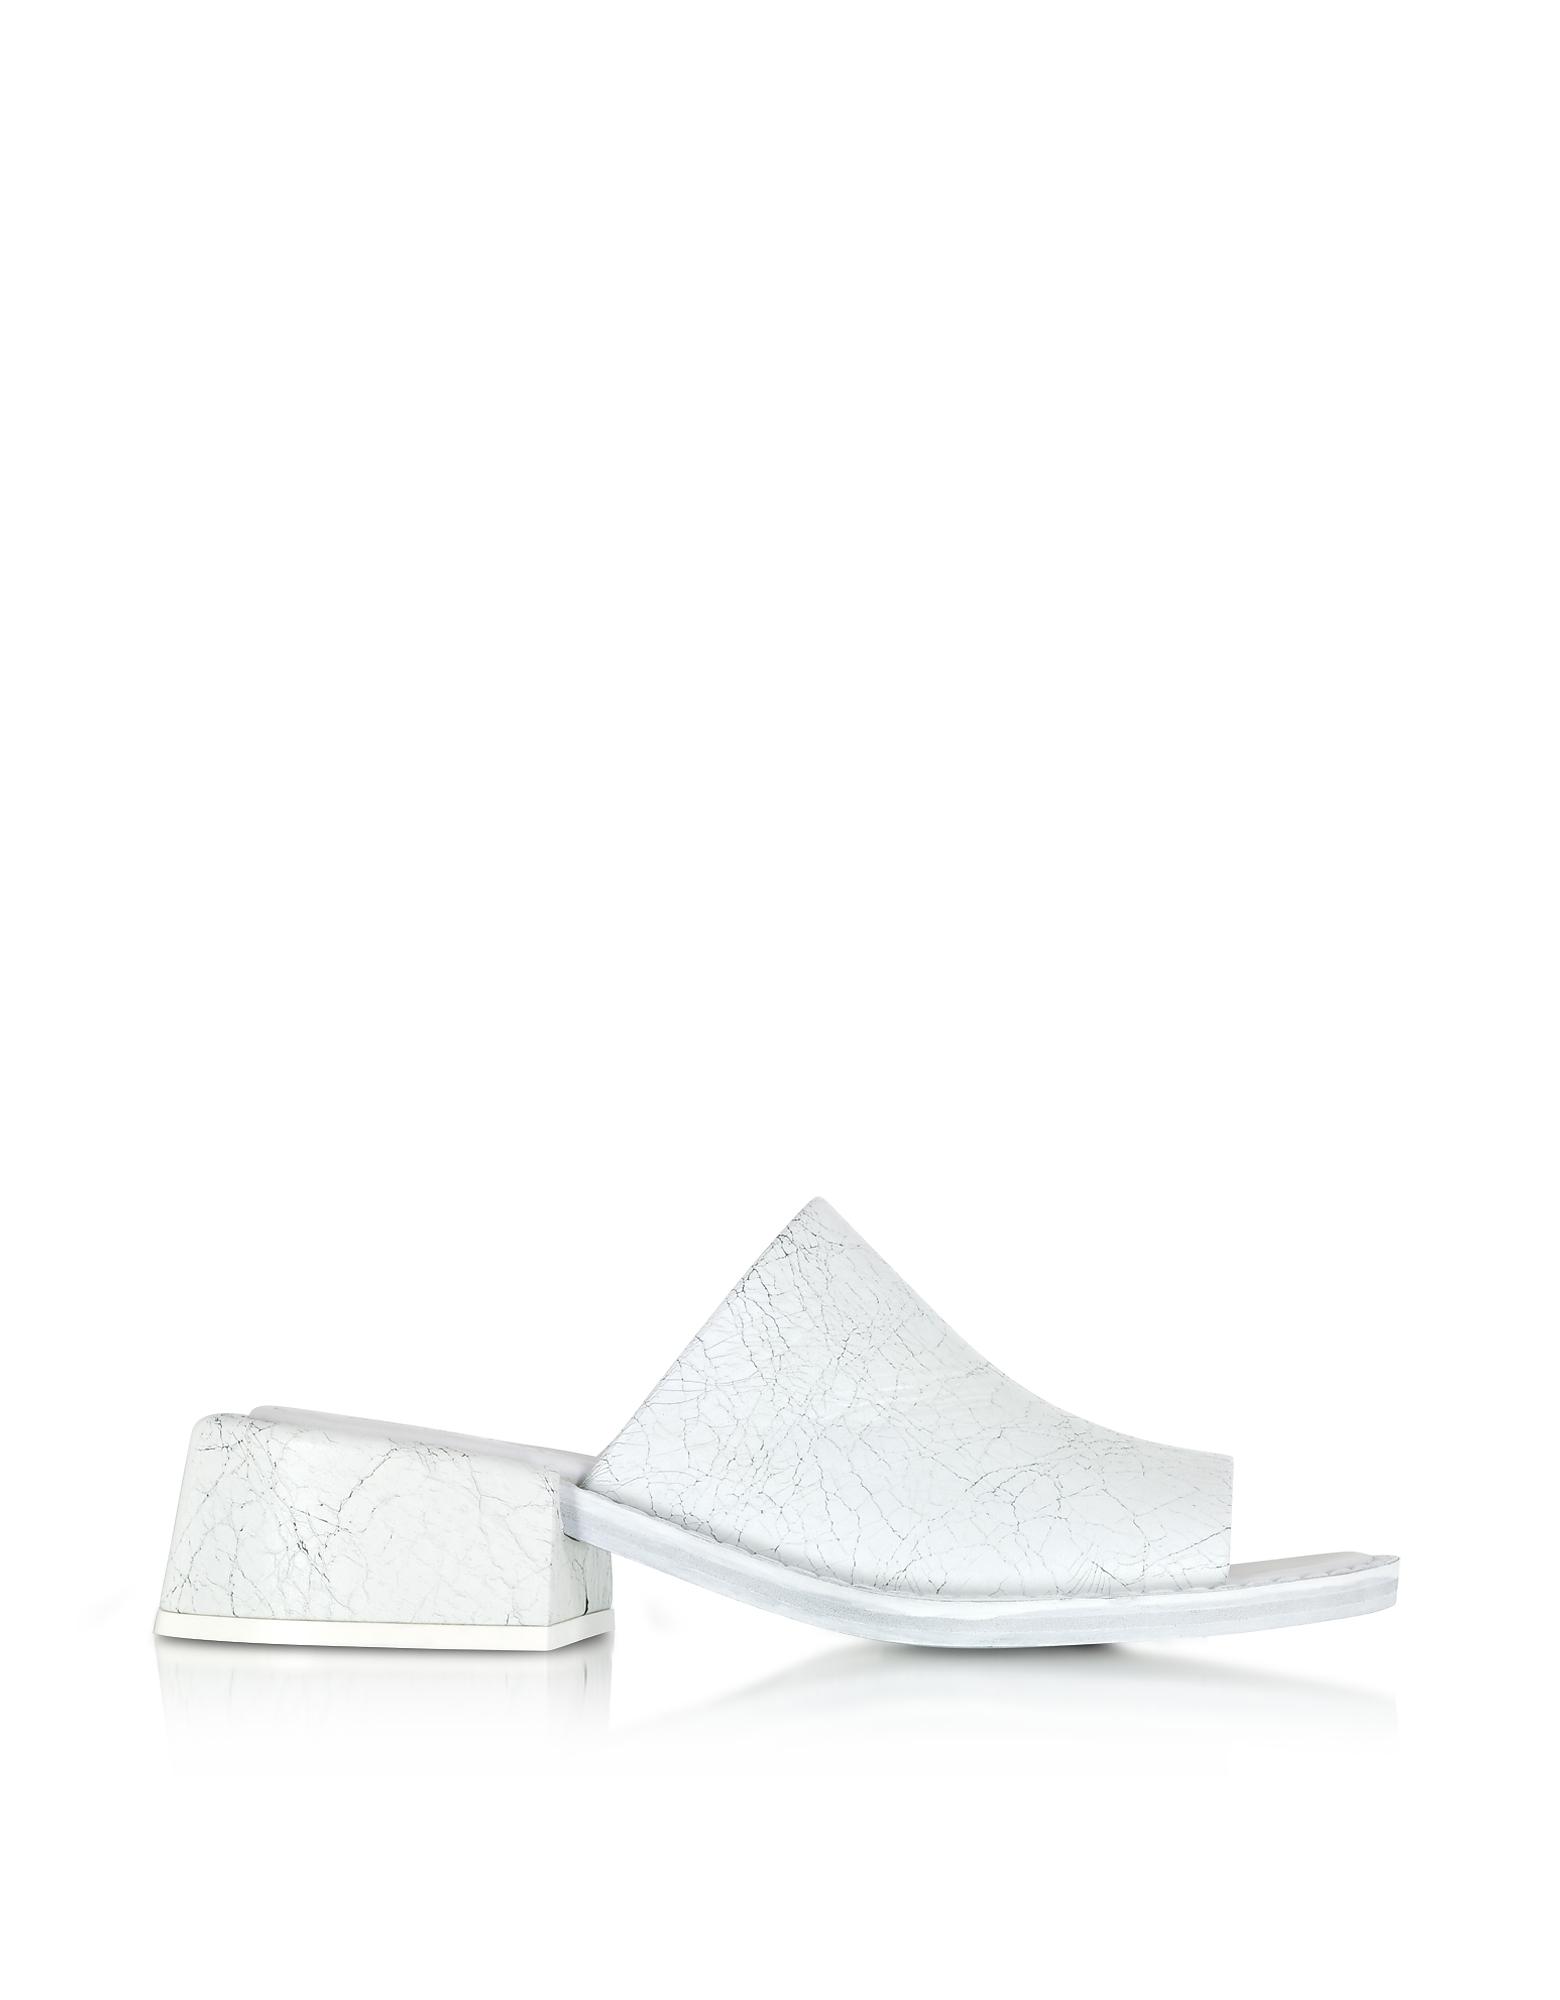 Sandali Slide in Pelle Craquele Bianco Ottico